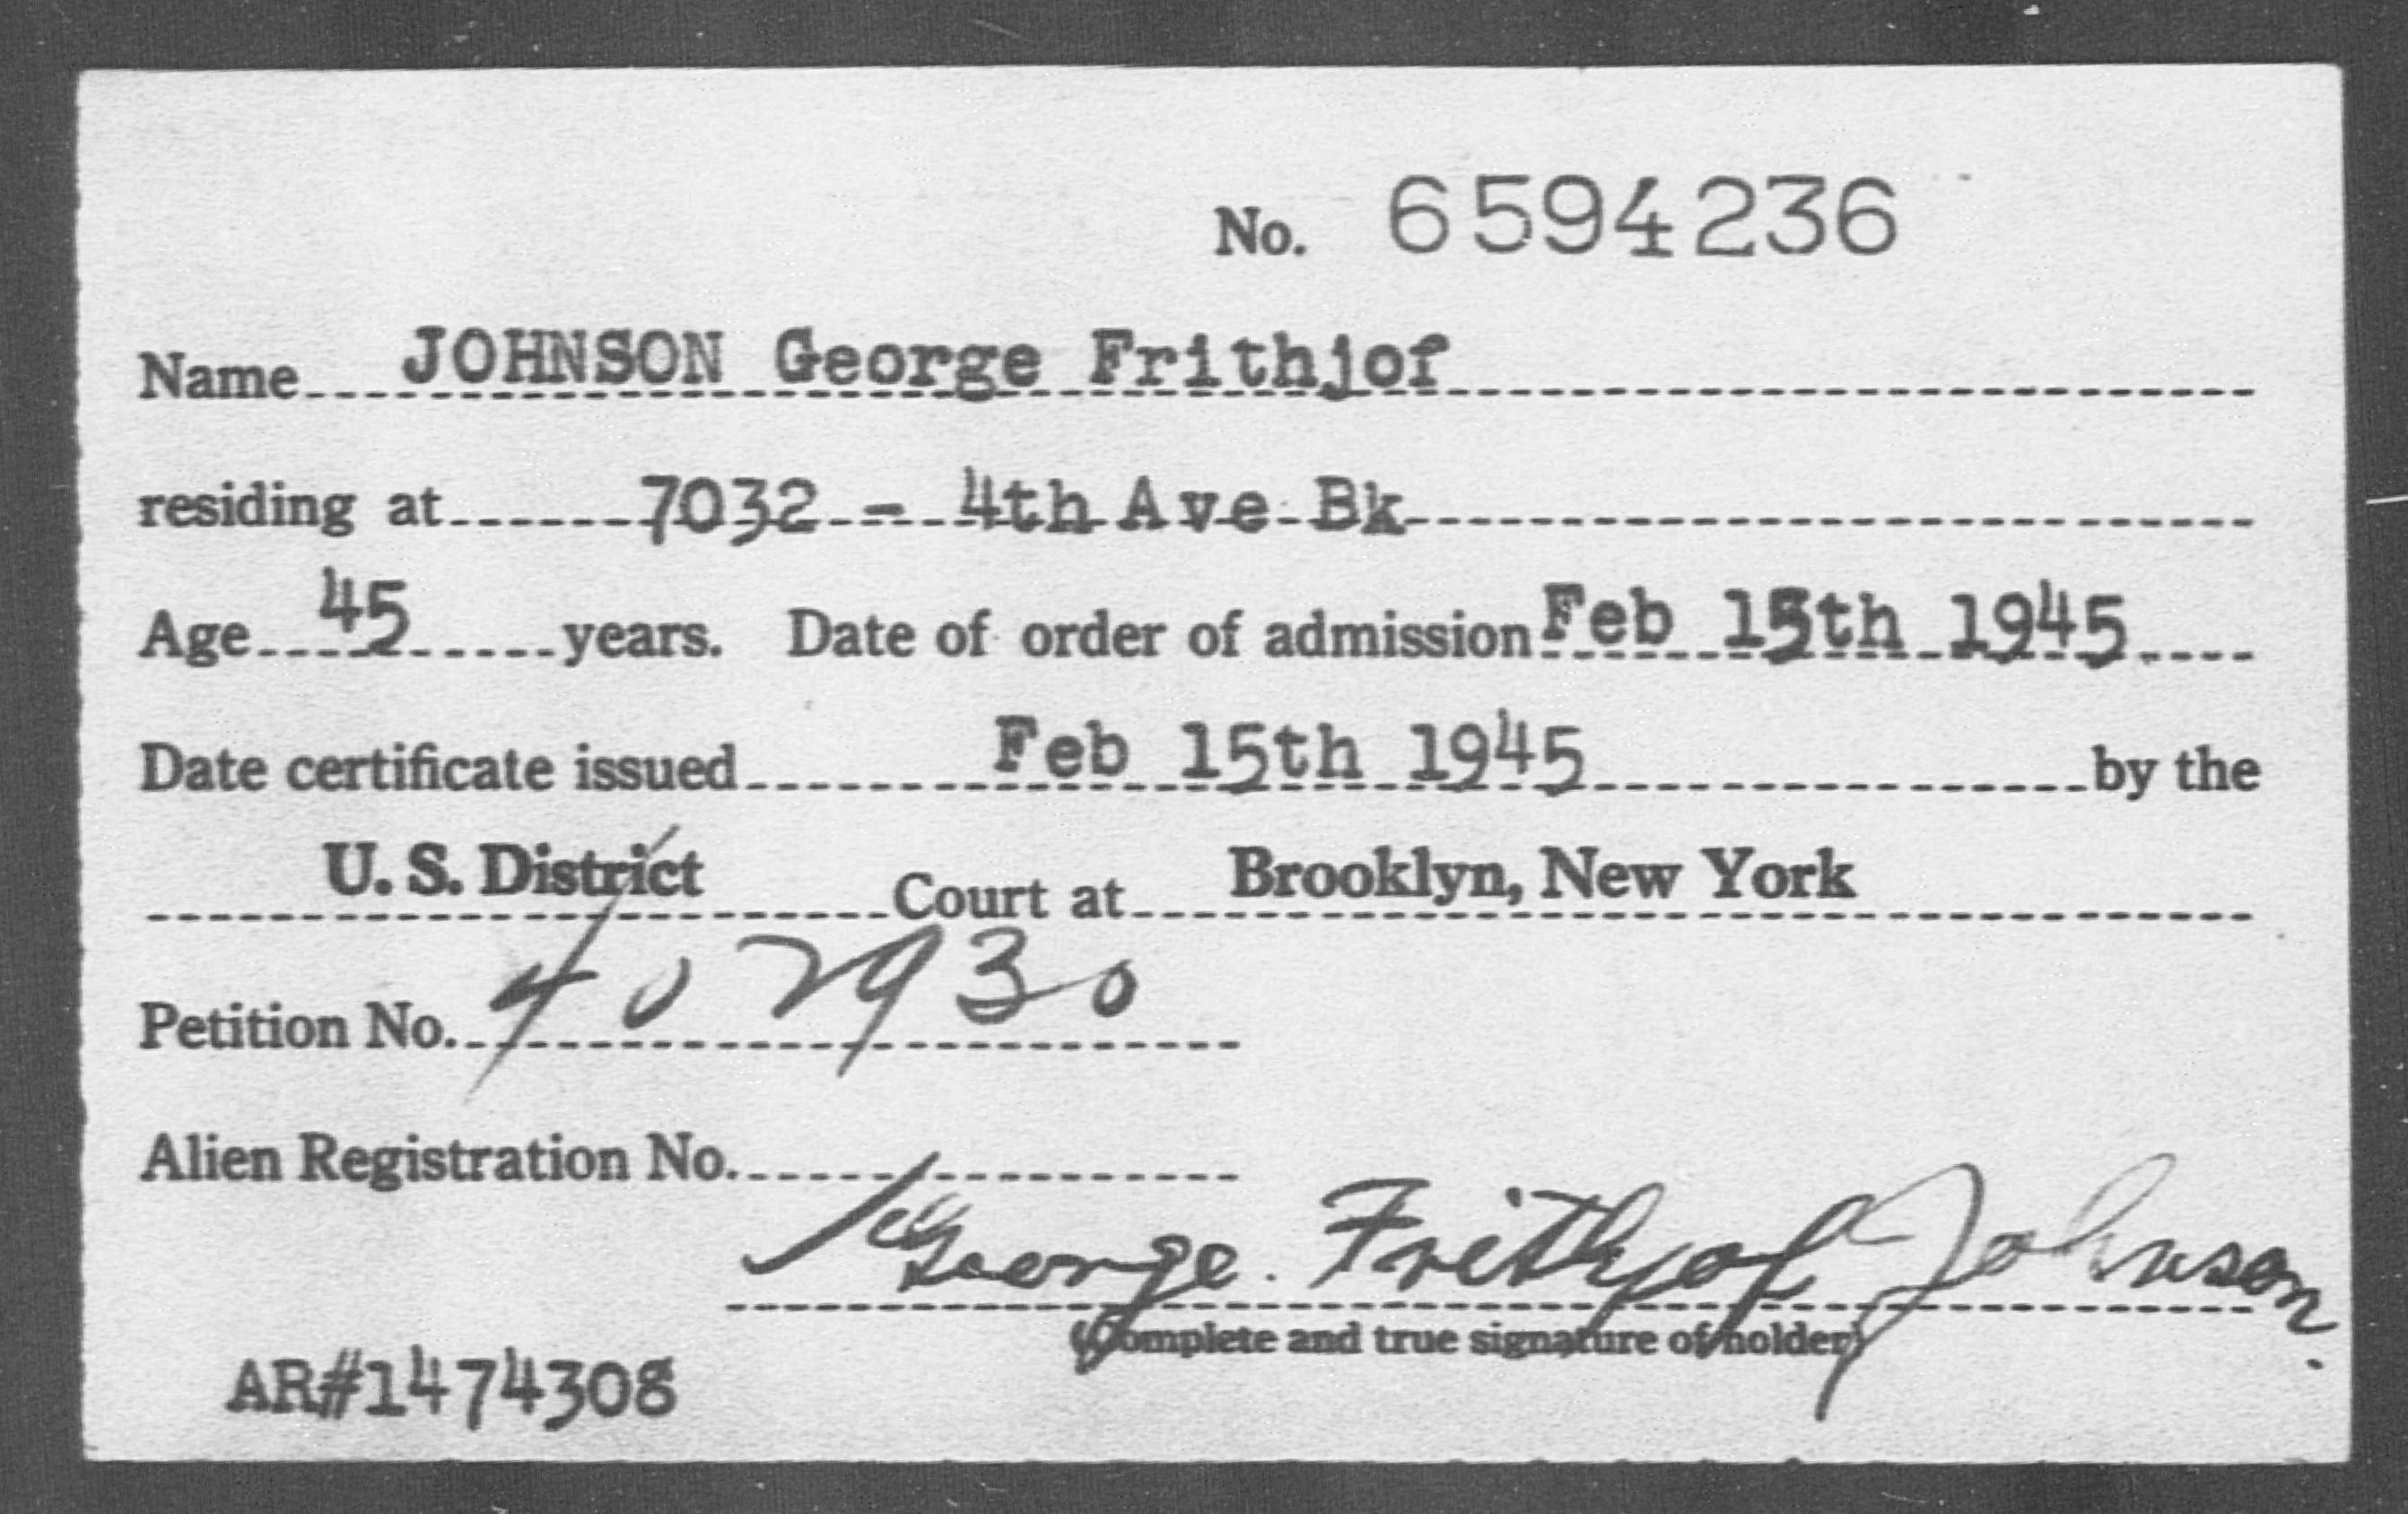 JOHNSON George Frithjof - Born: [BLANK], Naturalized: 1945